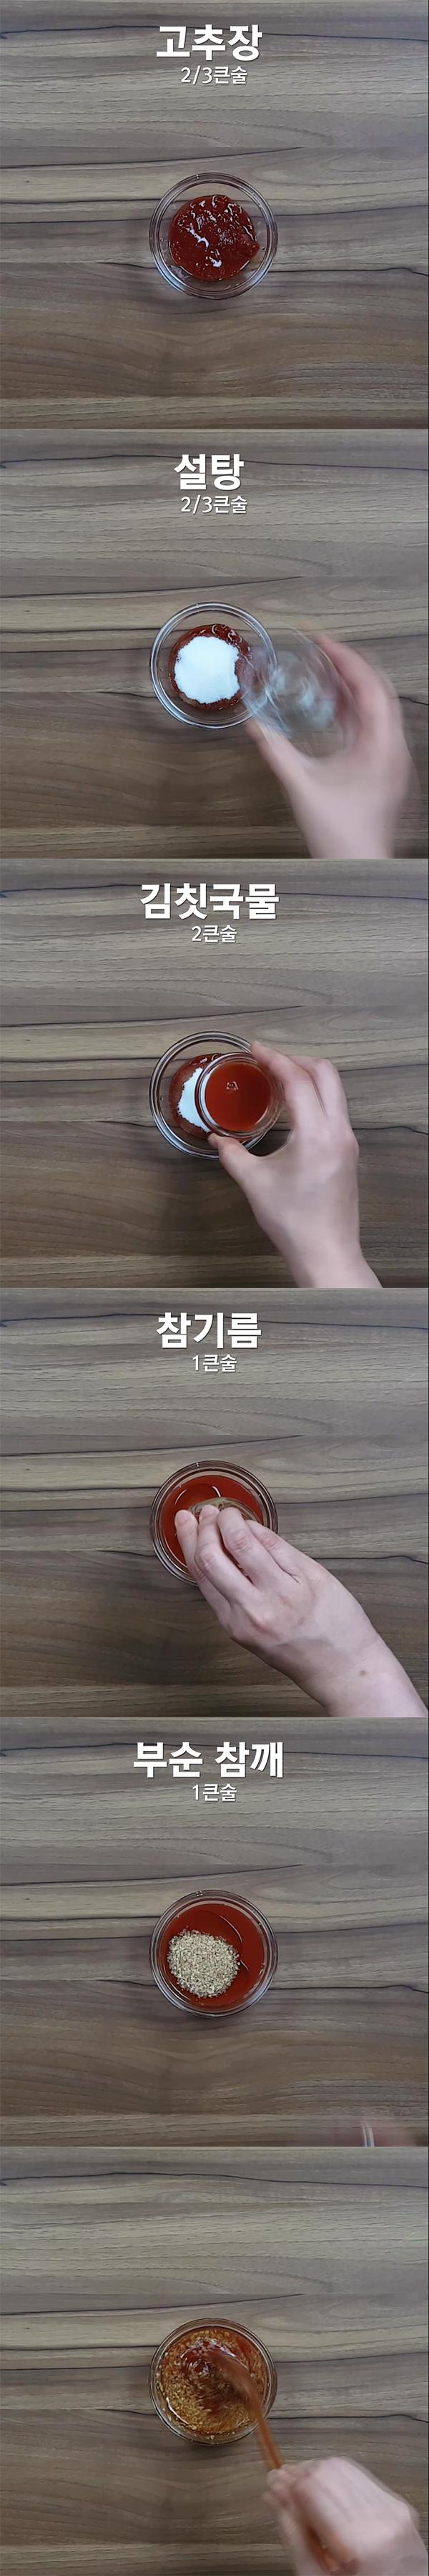 gold-recipe-of-kimchi-fried-rice 02